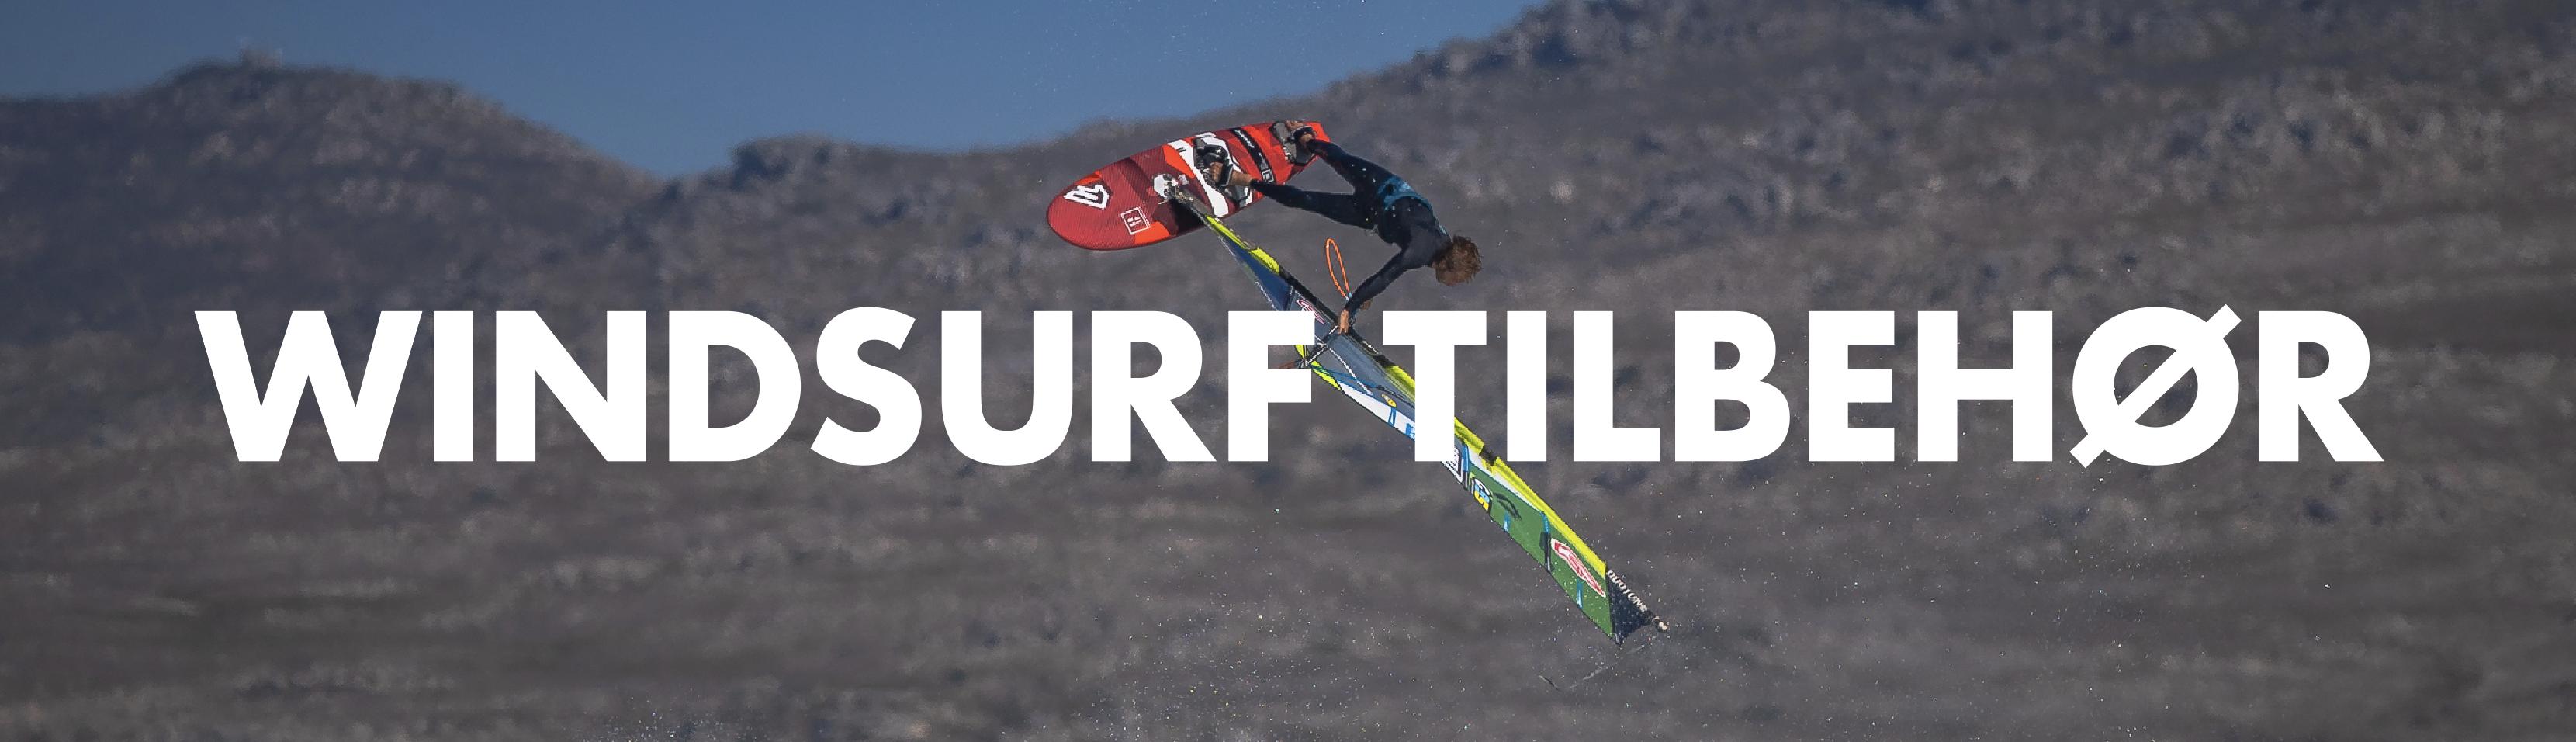 Windsurf Tilbehør - Surf og ski Horsens